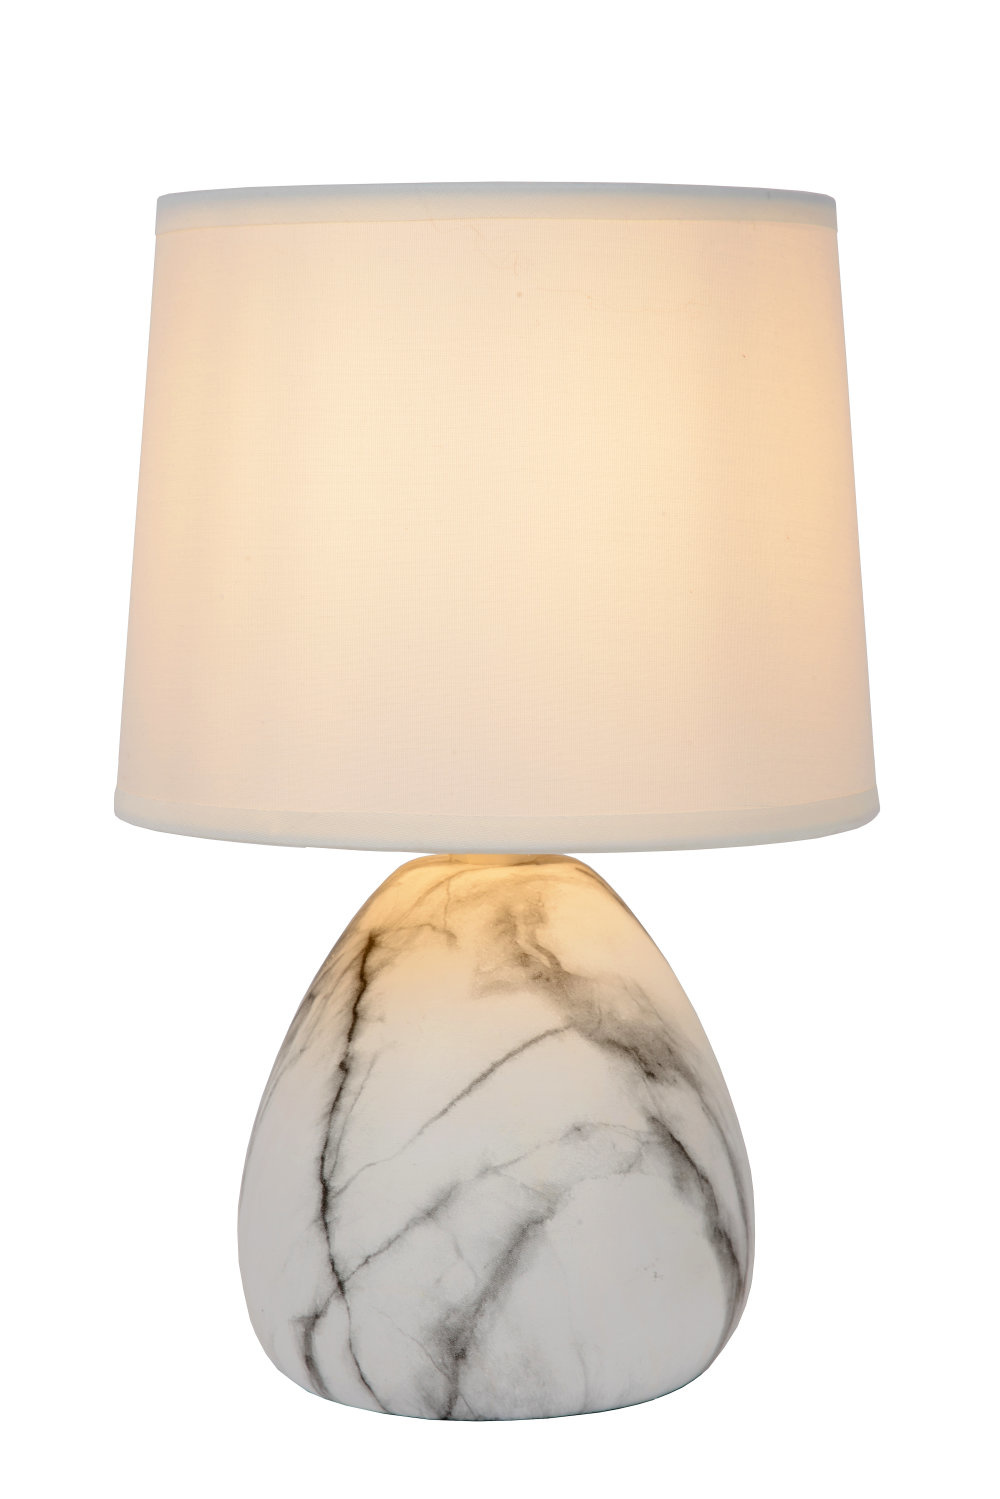 Lucide MARMO Tafellamp E14/4W Wit